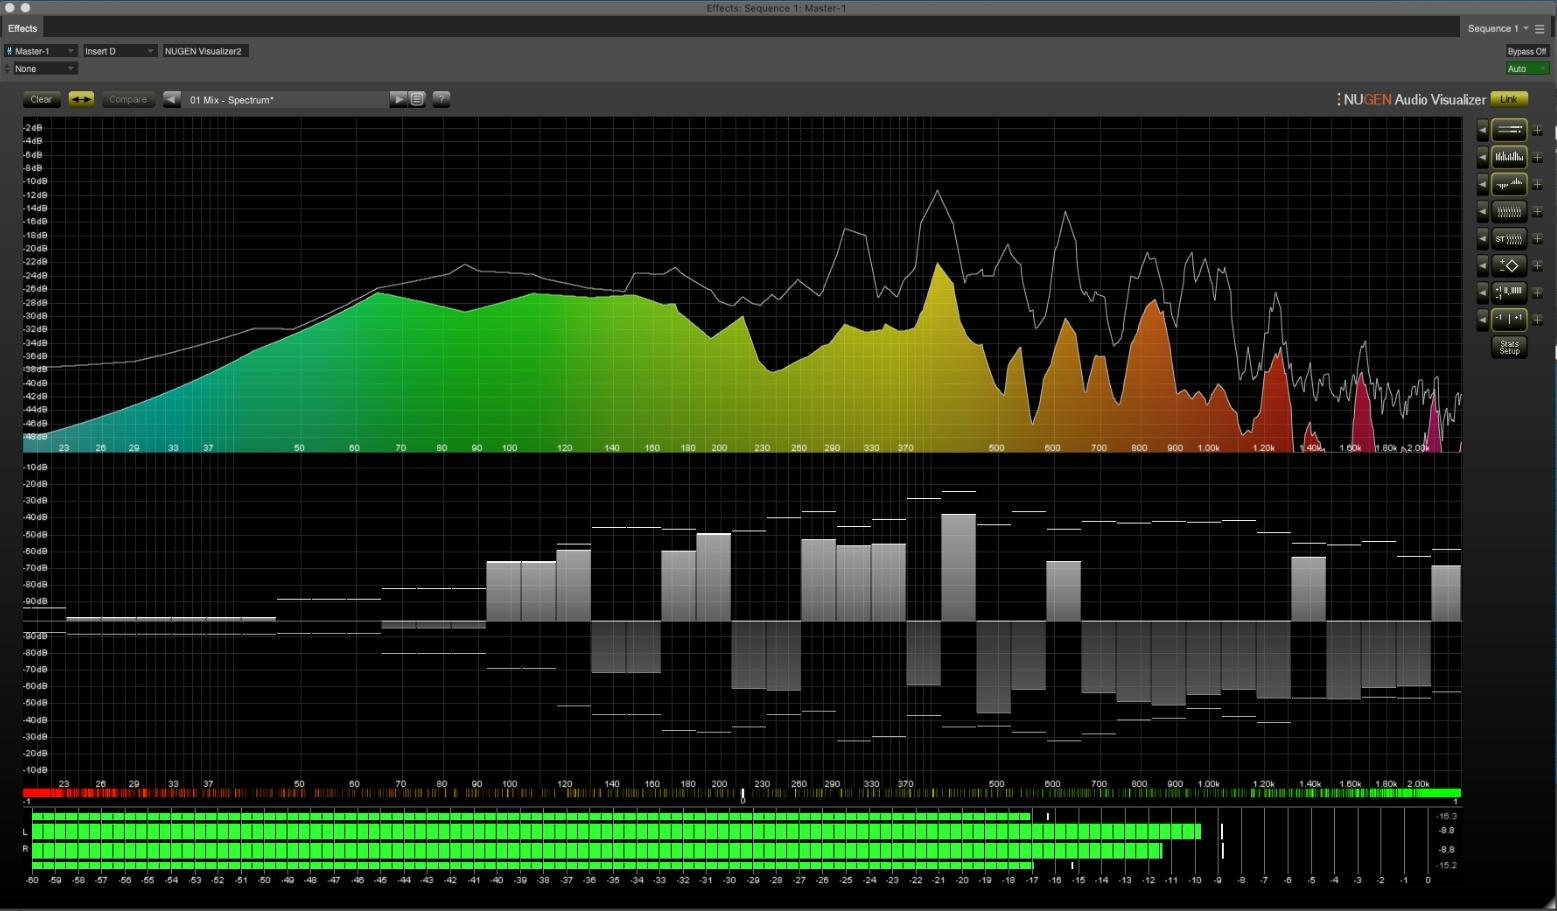 NUGEN Audio Visualizer Audio Analysis Suite | Sweetwater